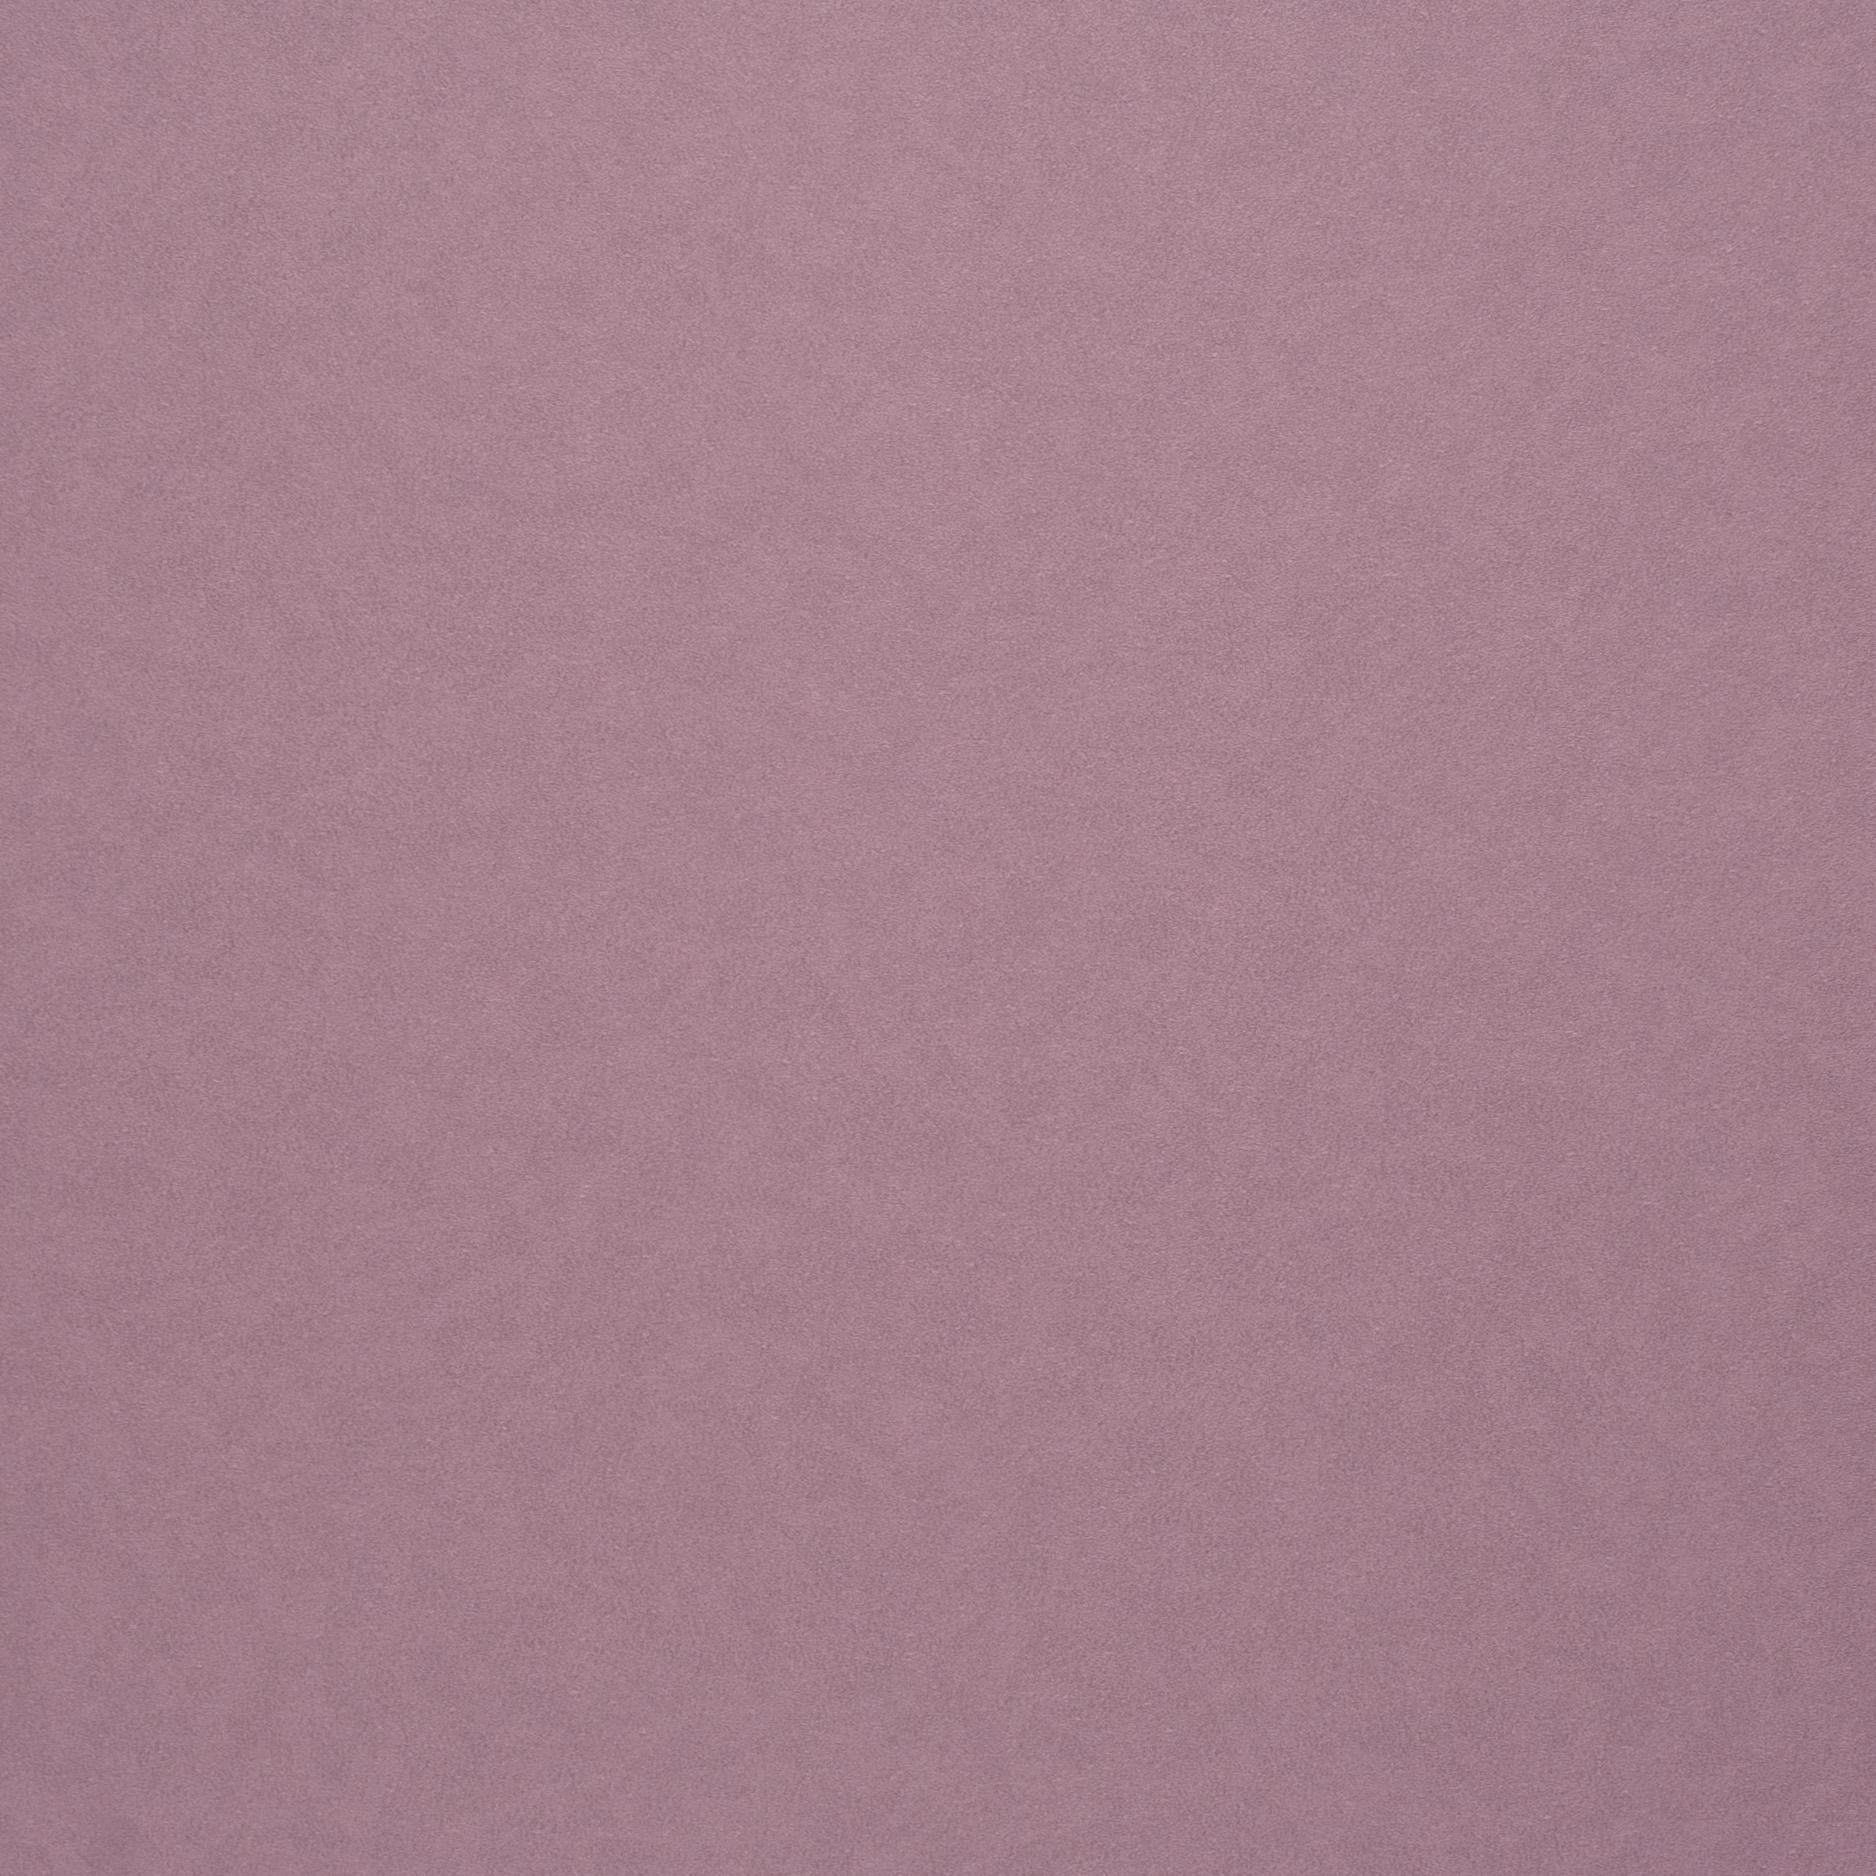 Обои  BN International,  коллекция Colour Line, артикул49357